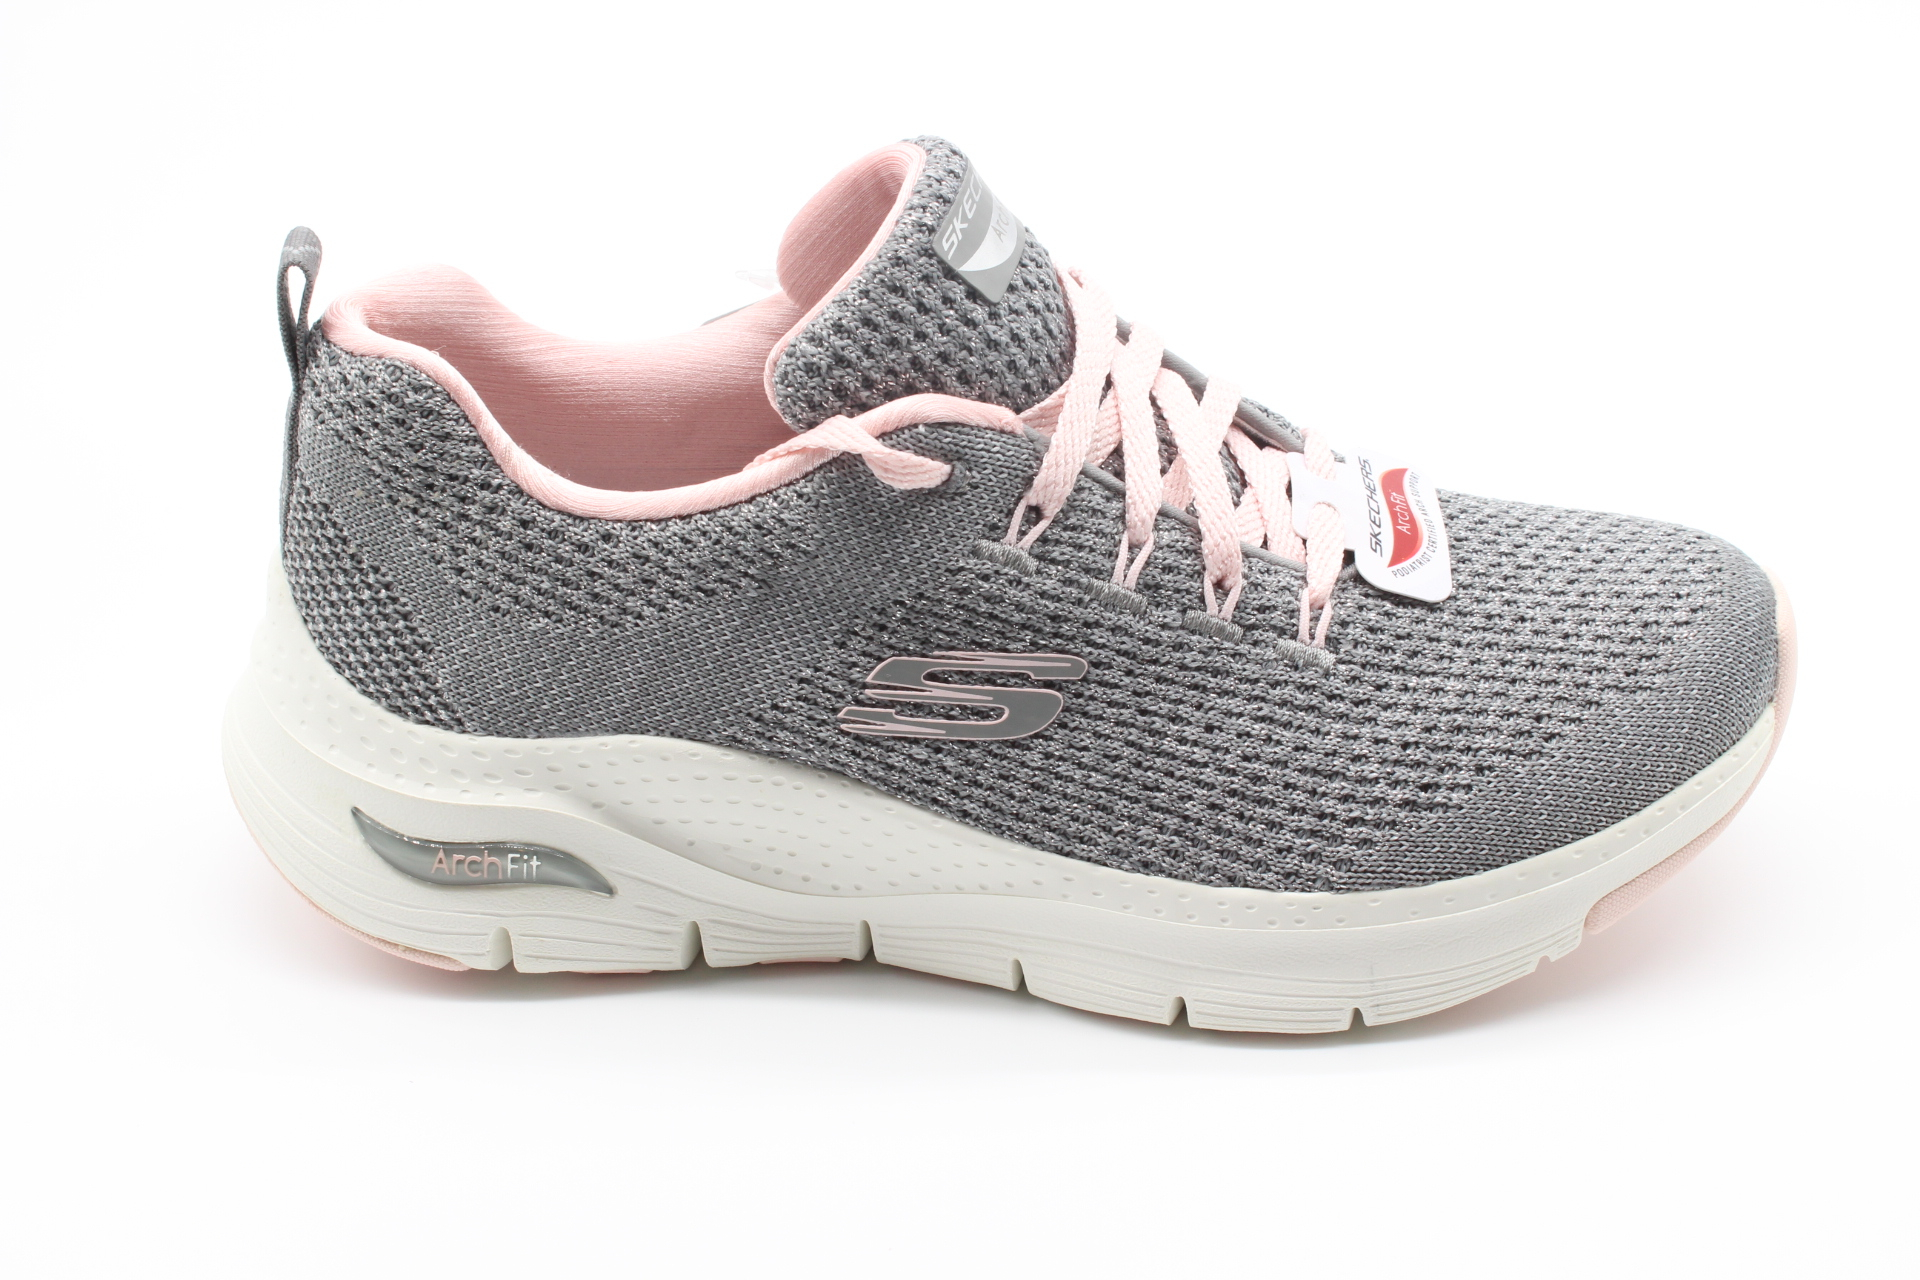 Skechers Arch-fit scarpa donna sportiva